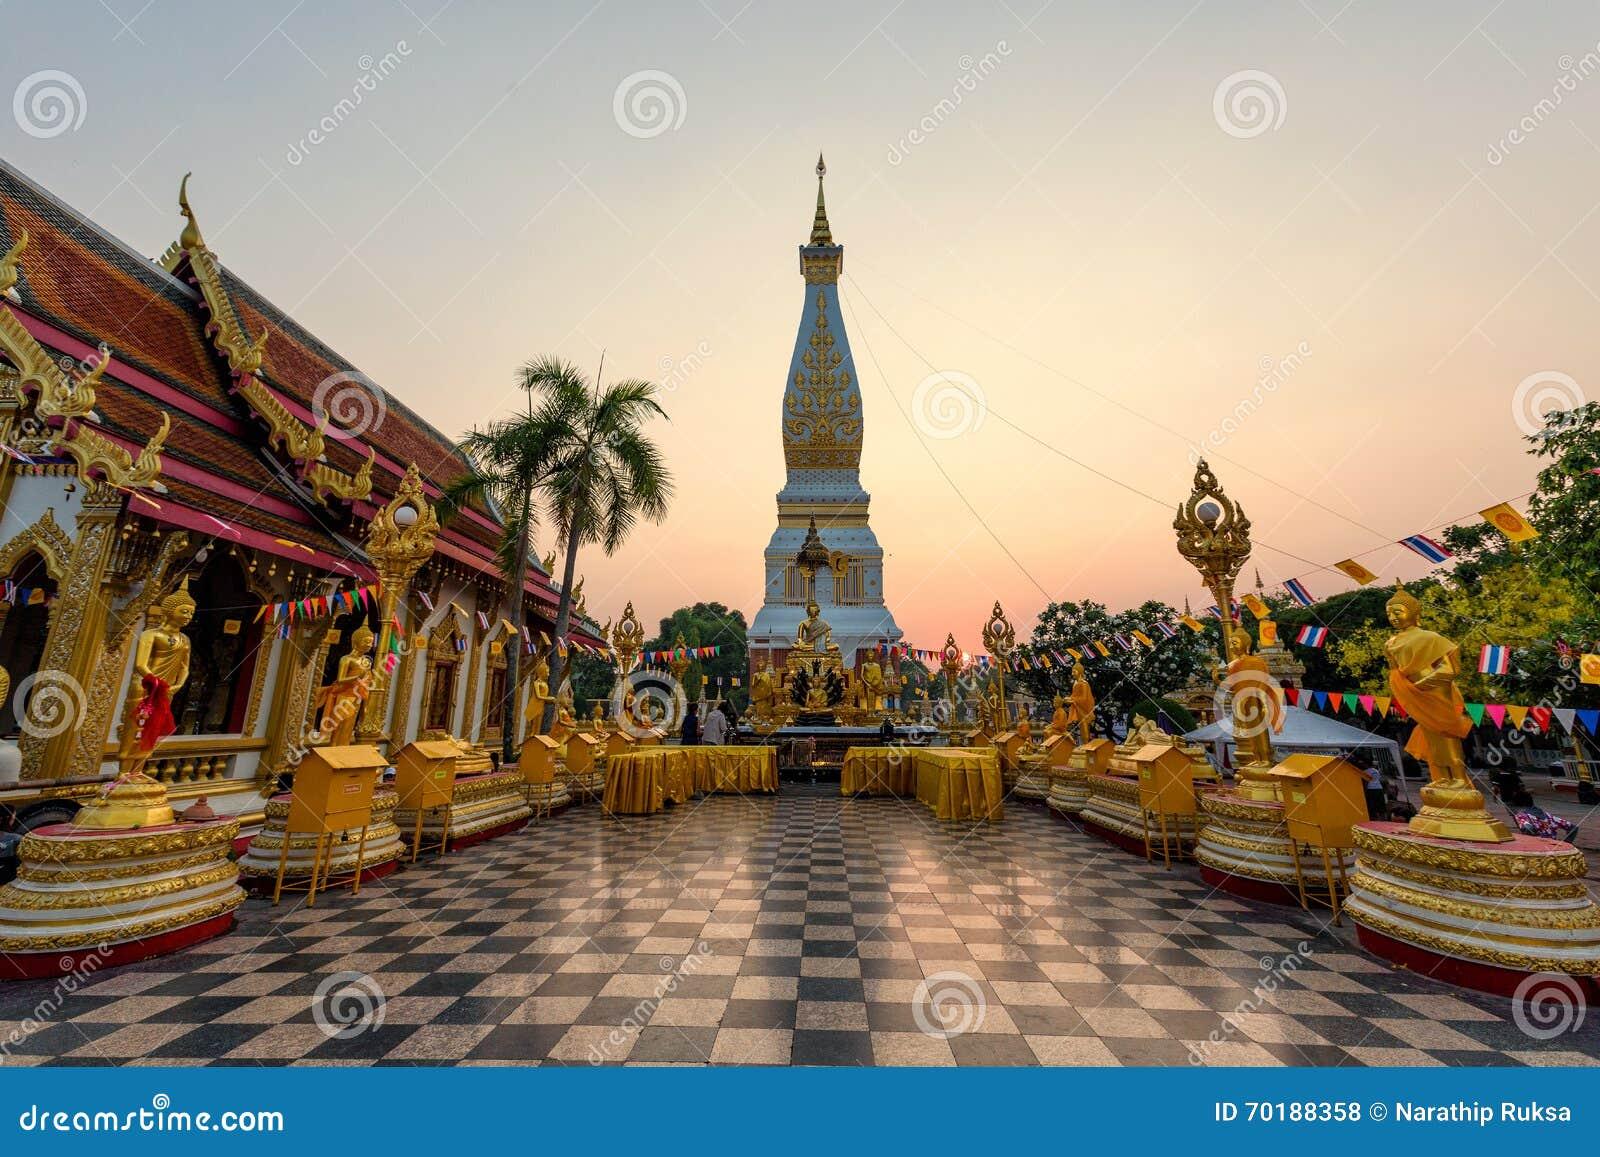 Wat Phra That Phanom Temple under solnedgång på det Nakhon Phanom landskapet, Thailand